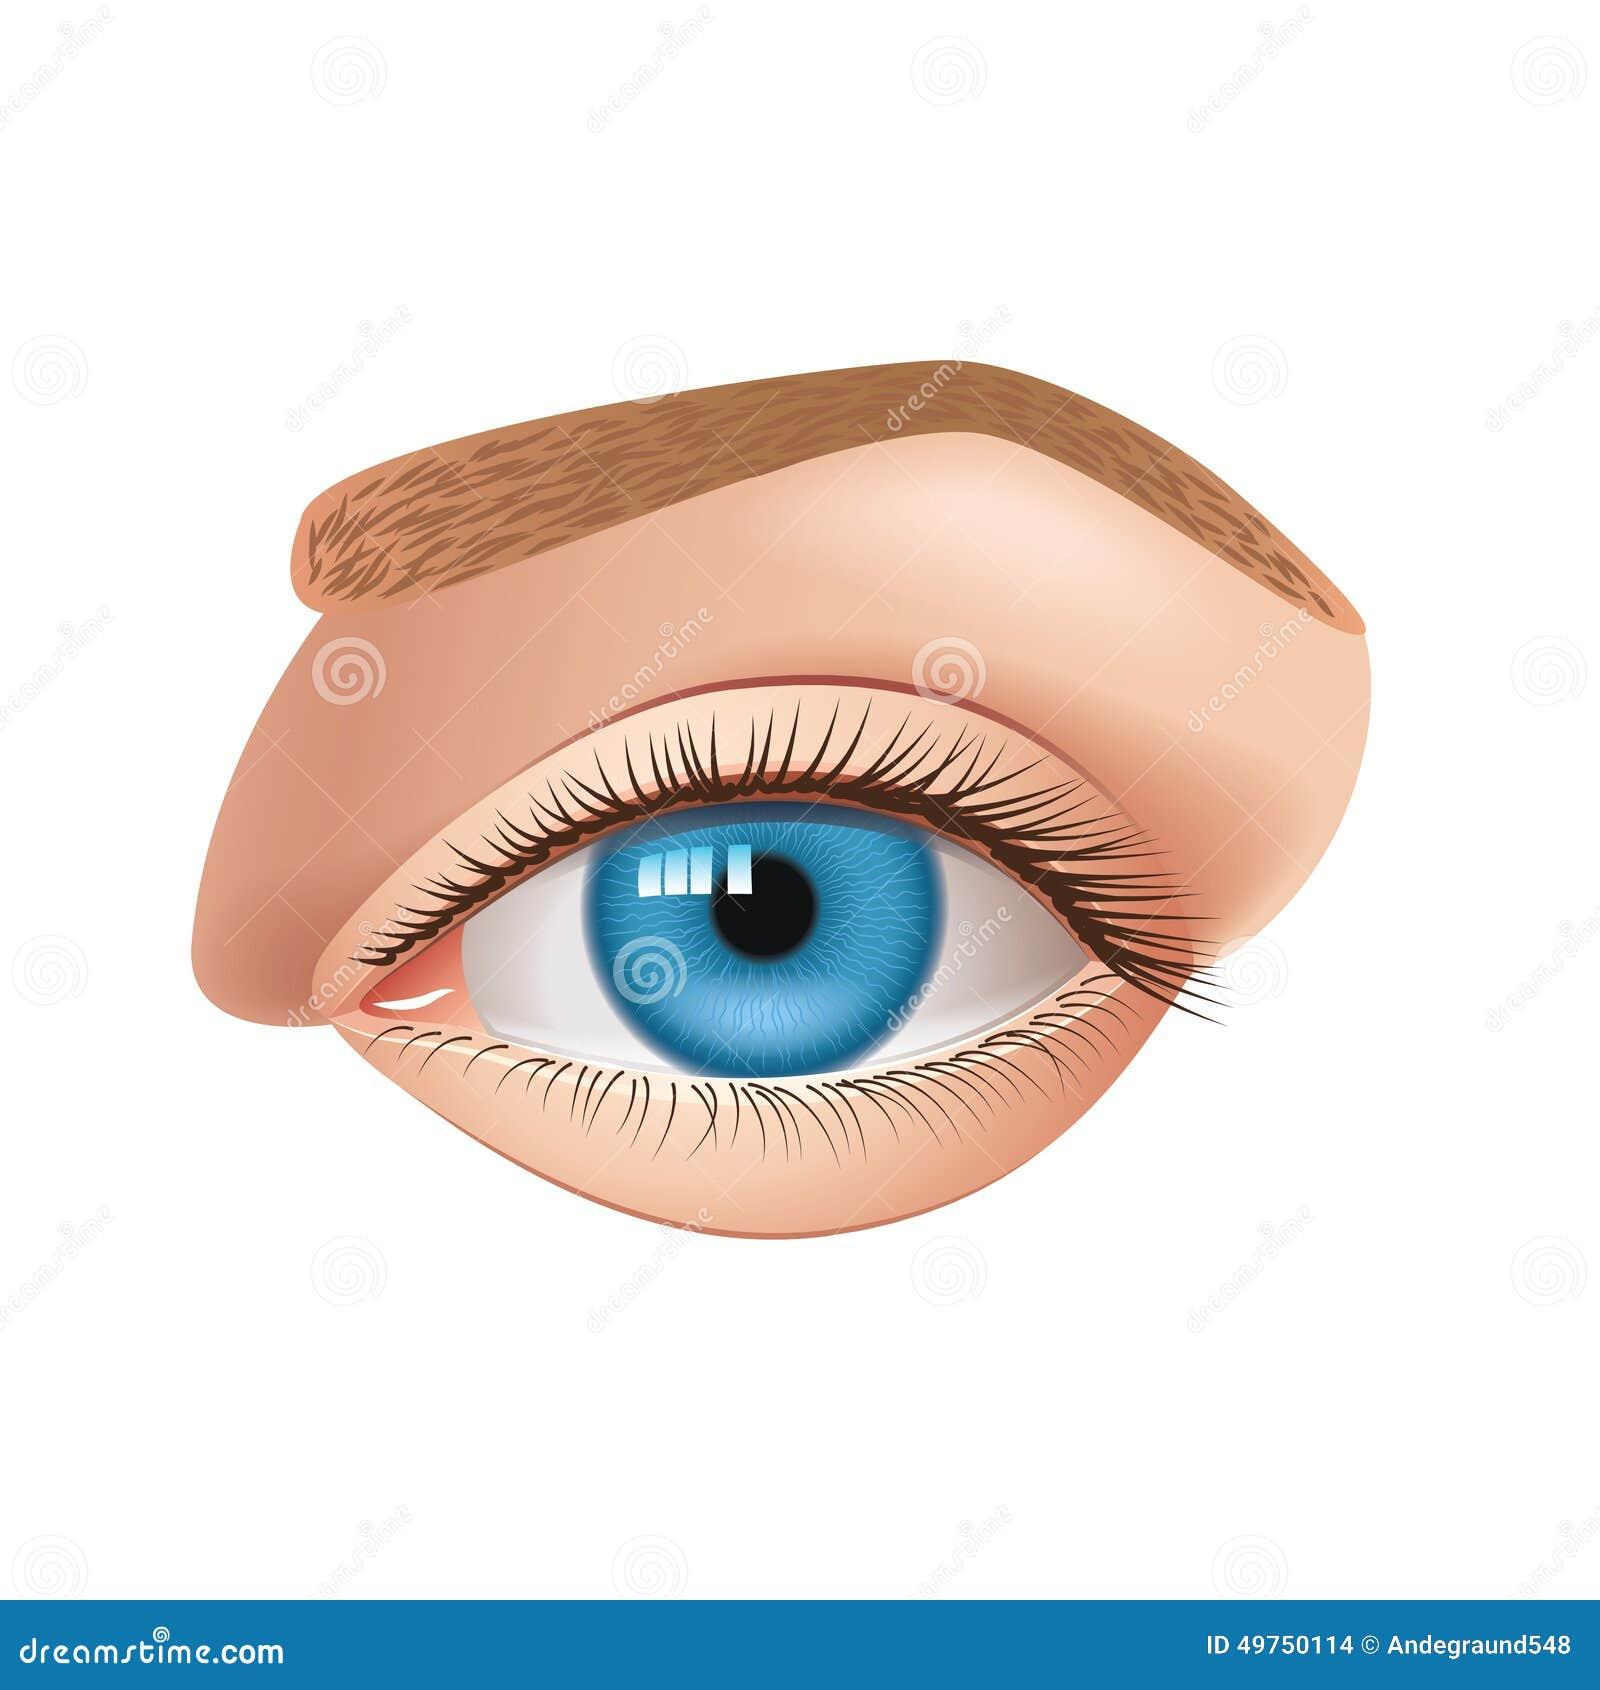 pics Anatomy of the Human Eye